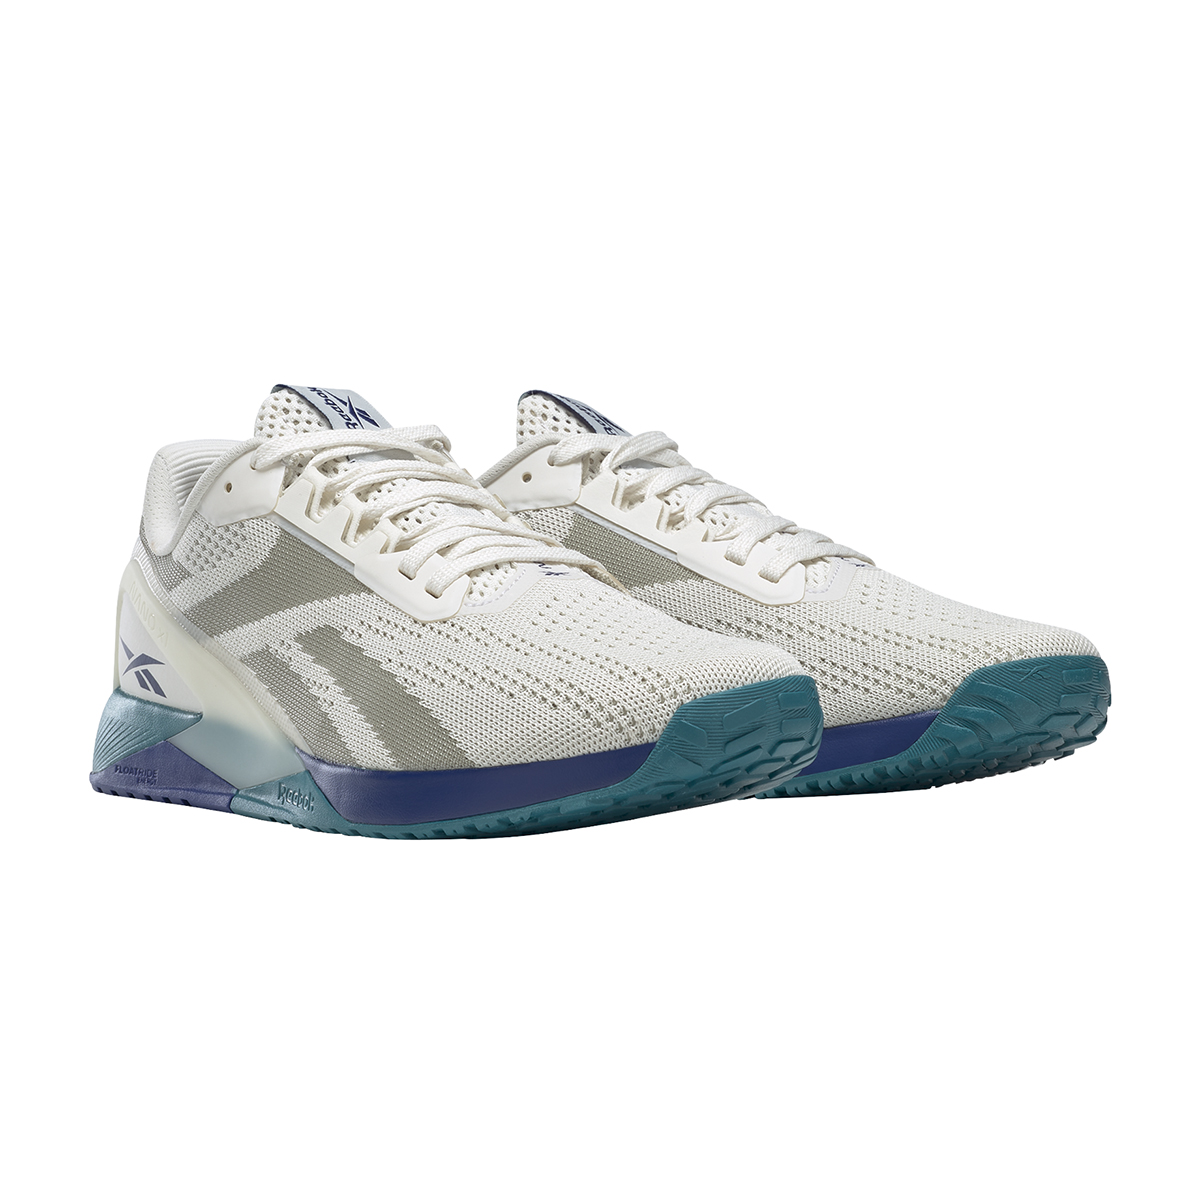 Men's Reebok Nano X1 Training Shoe - Color: Chalk/Classic Cobalt/Seaport Teal   - Size: 6 - Width: Regular, Chalk/Classic Cobalt/Seaport Teal, large, image 5